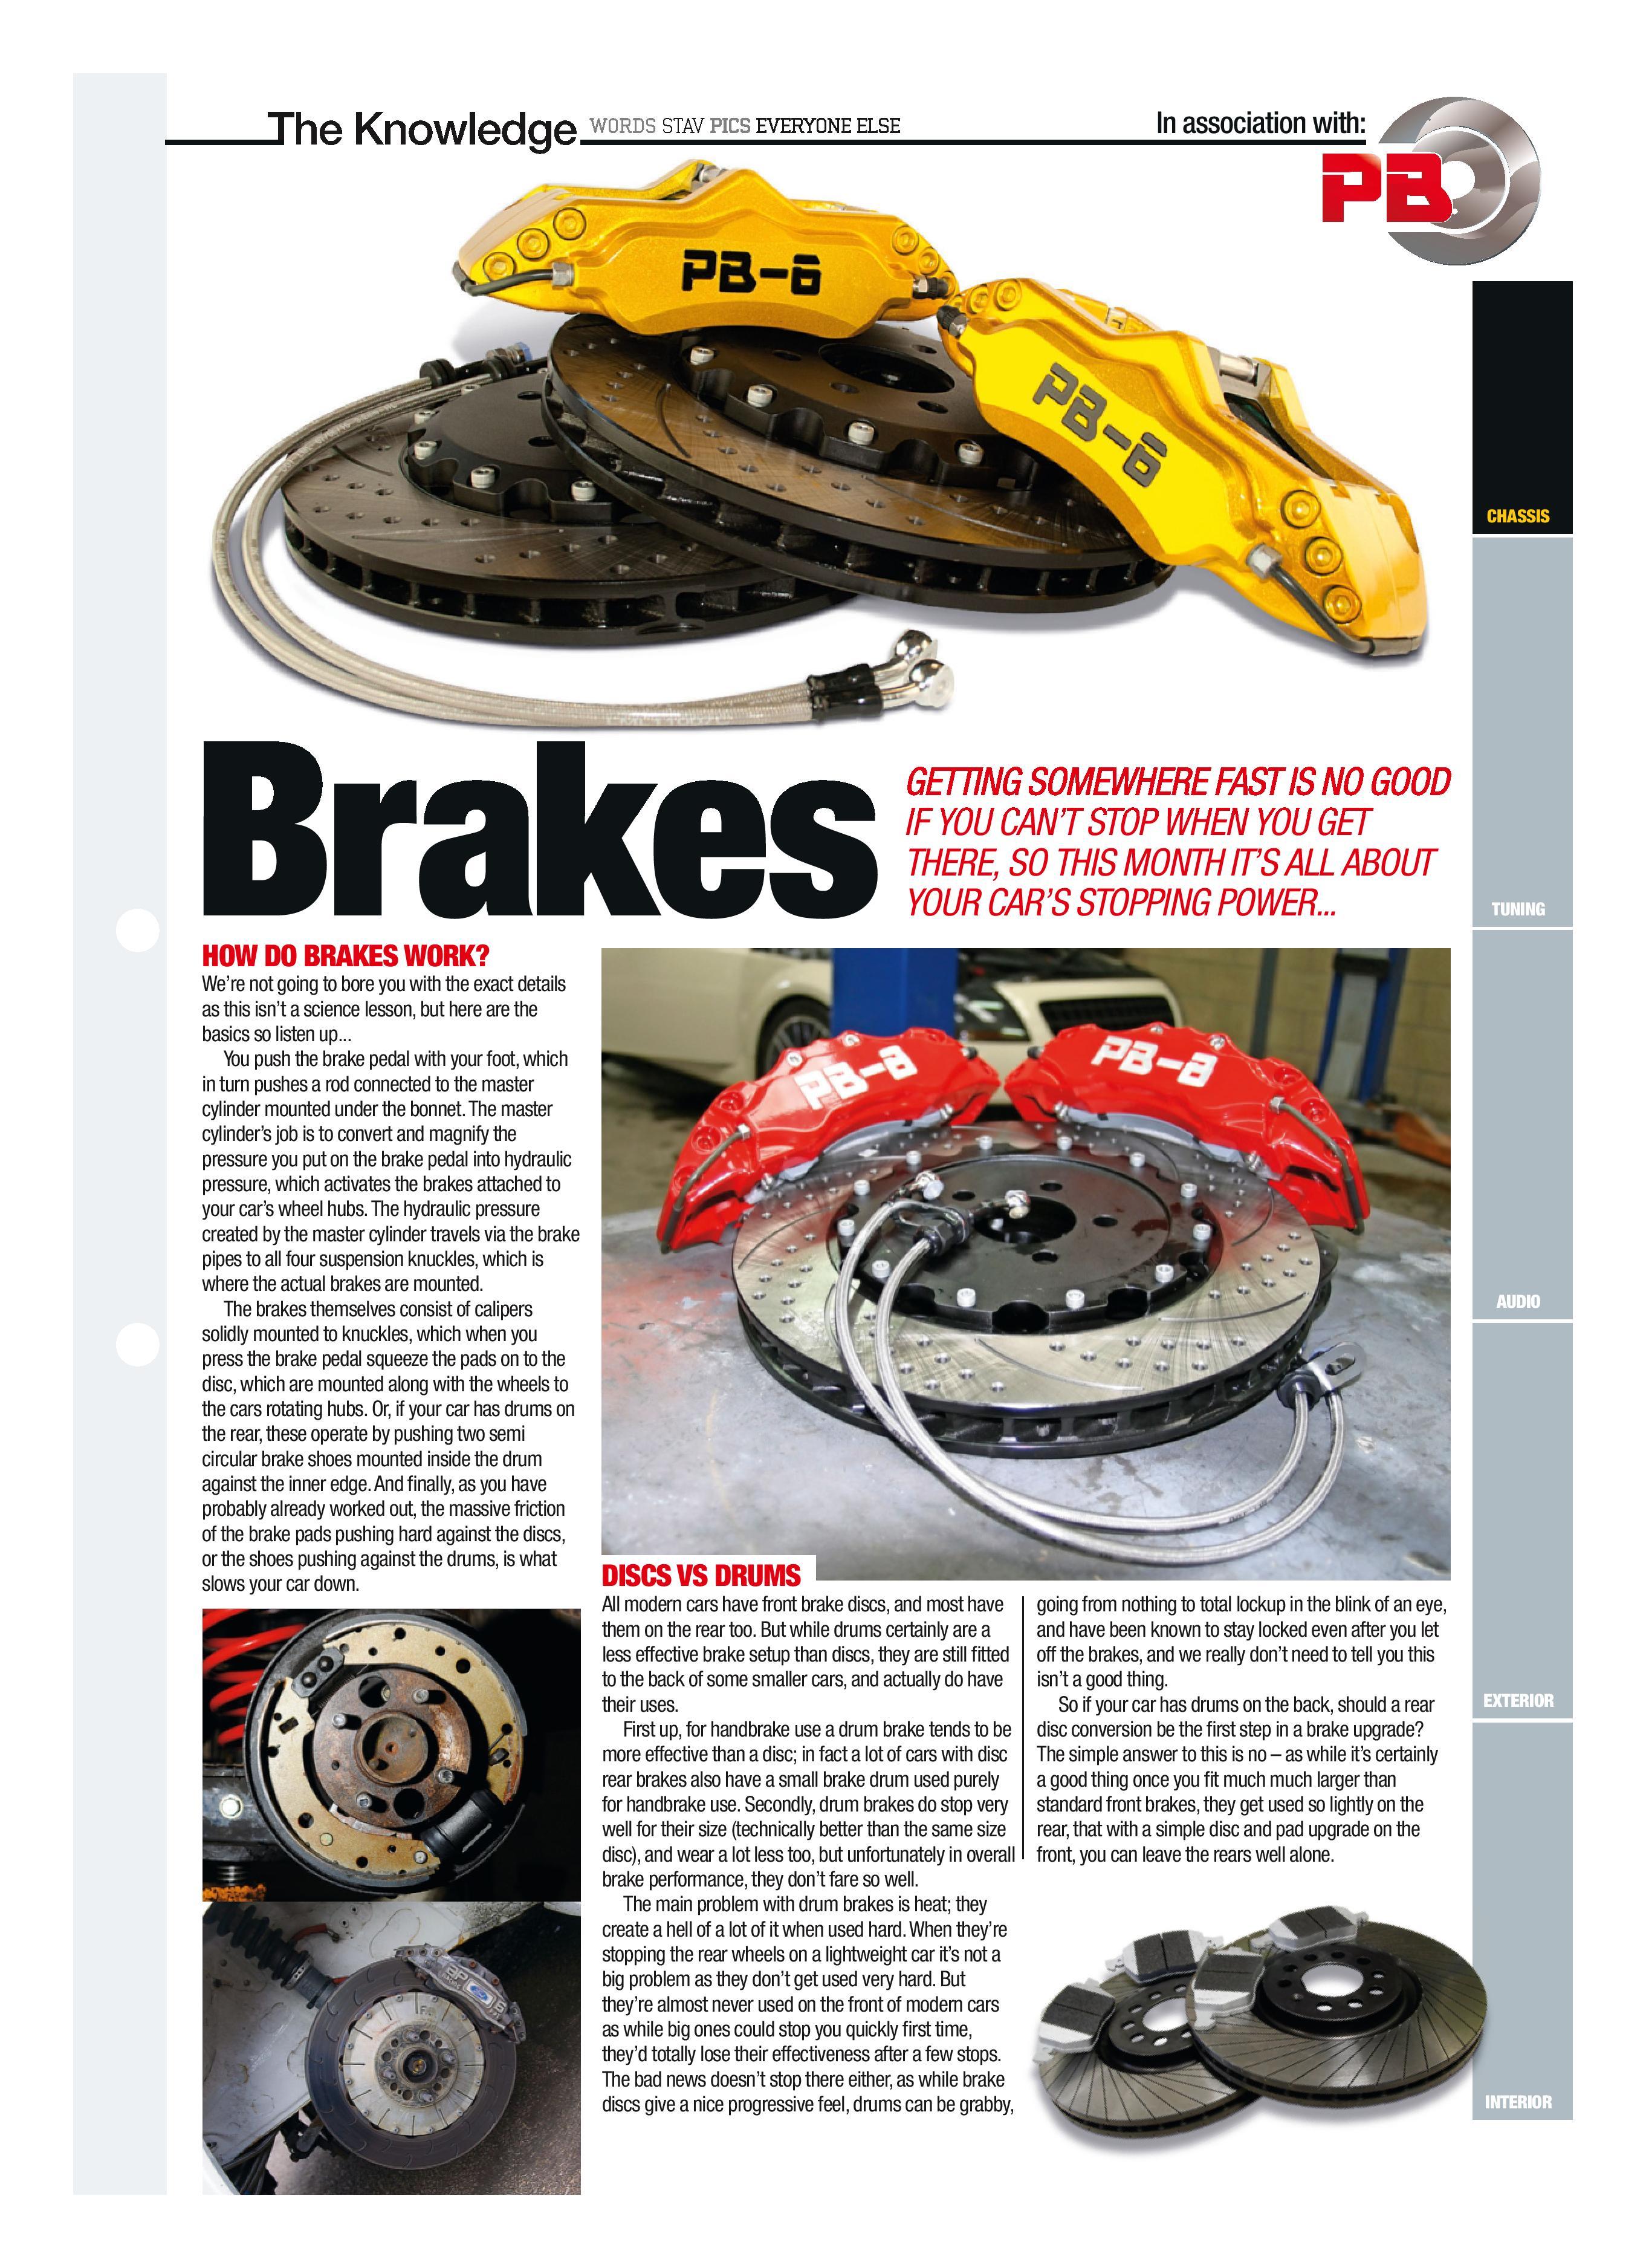 Fast Car Magazine brake feature sponsored by PB